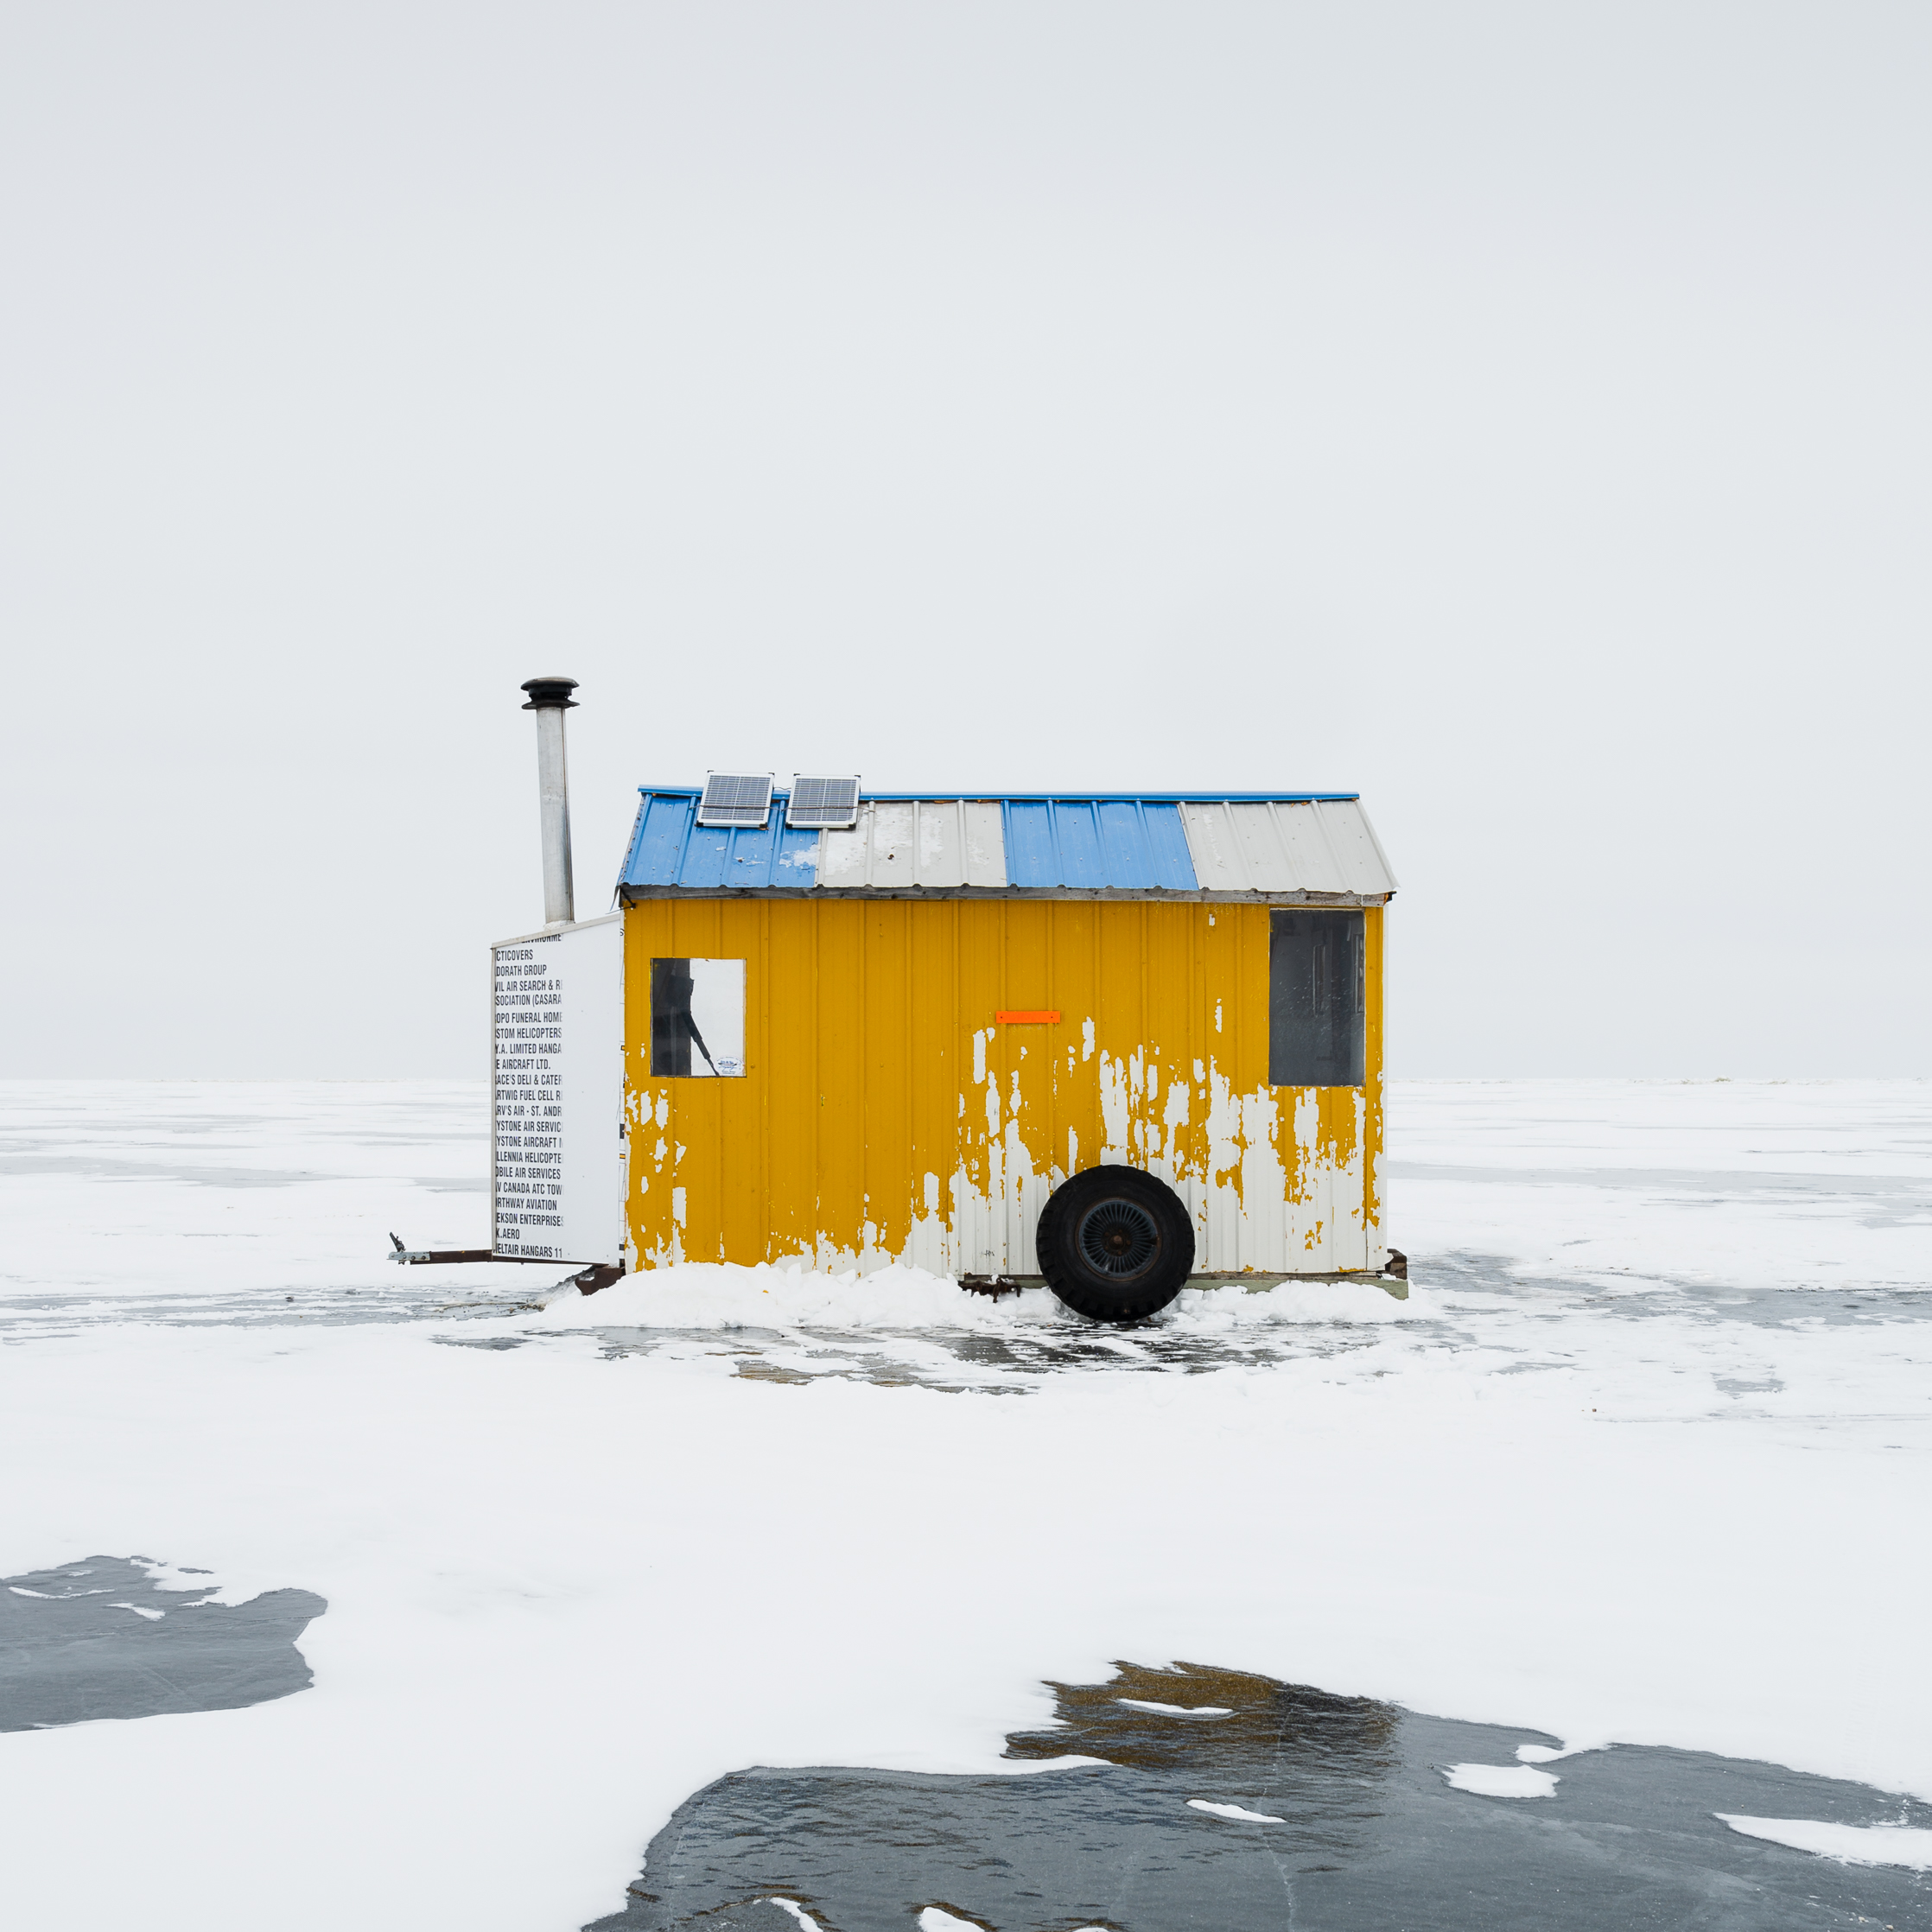 © Sandra Herber, Canada, Finalist, Professional, Architecture, 2020 Sony World Photography Awards